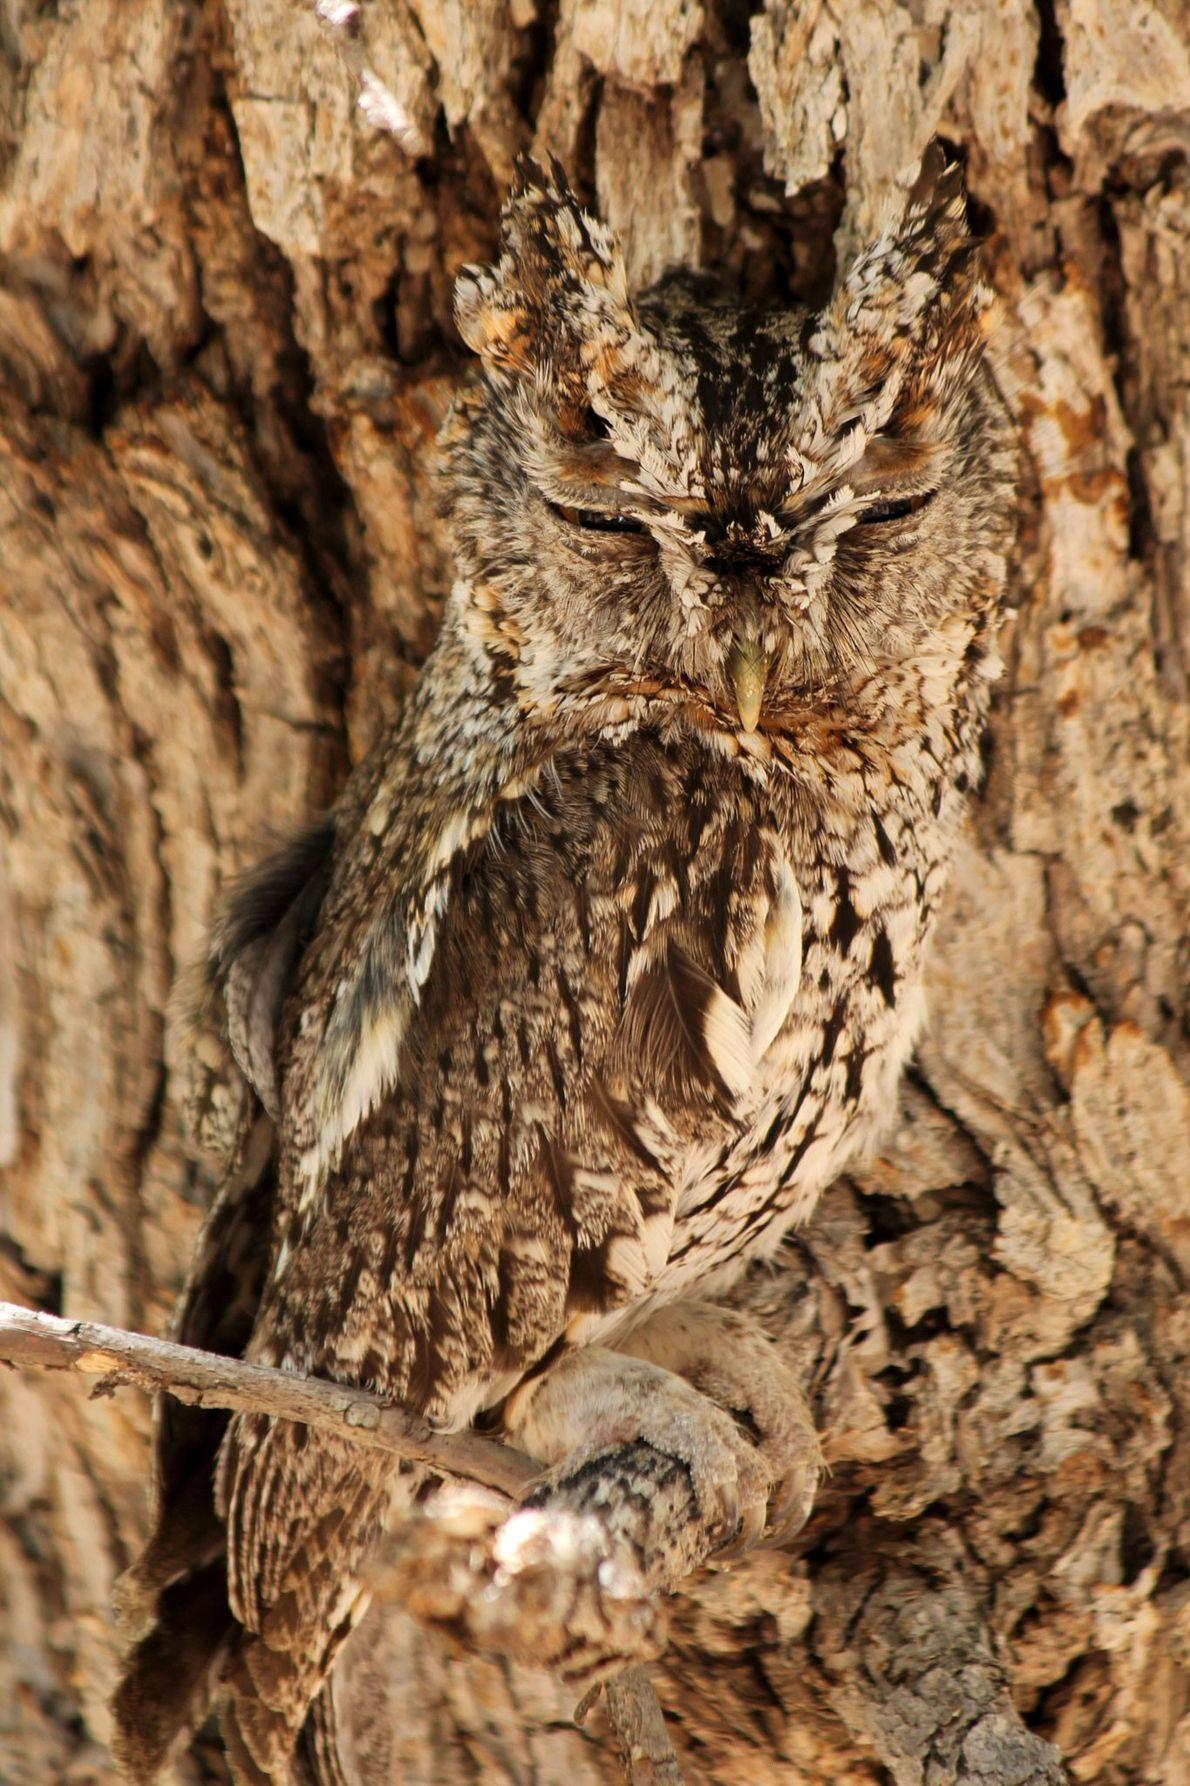 Whiskered screech owl. Cave Creek Canyon, Arizona, United States